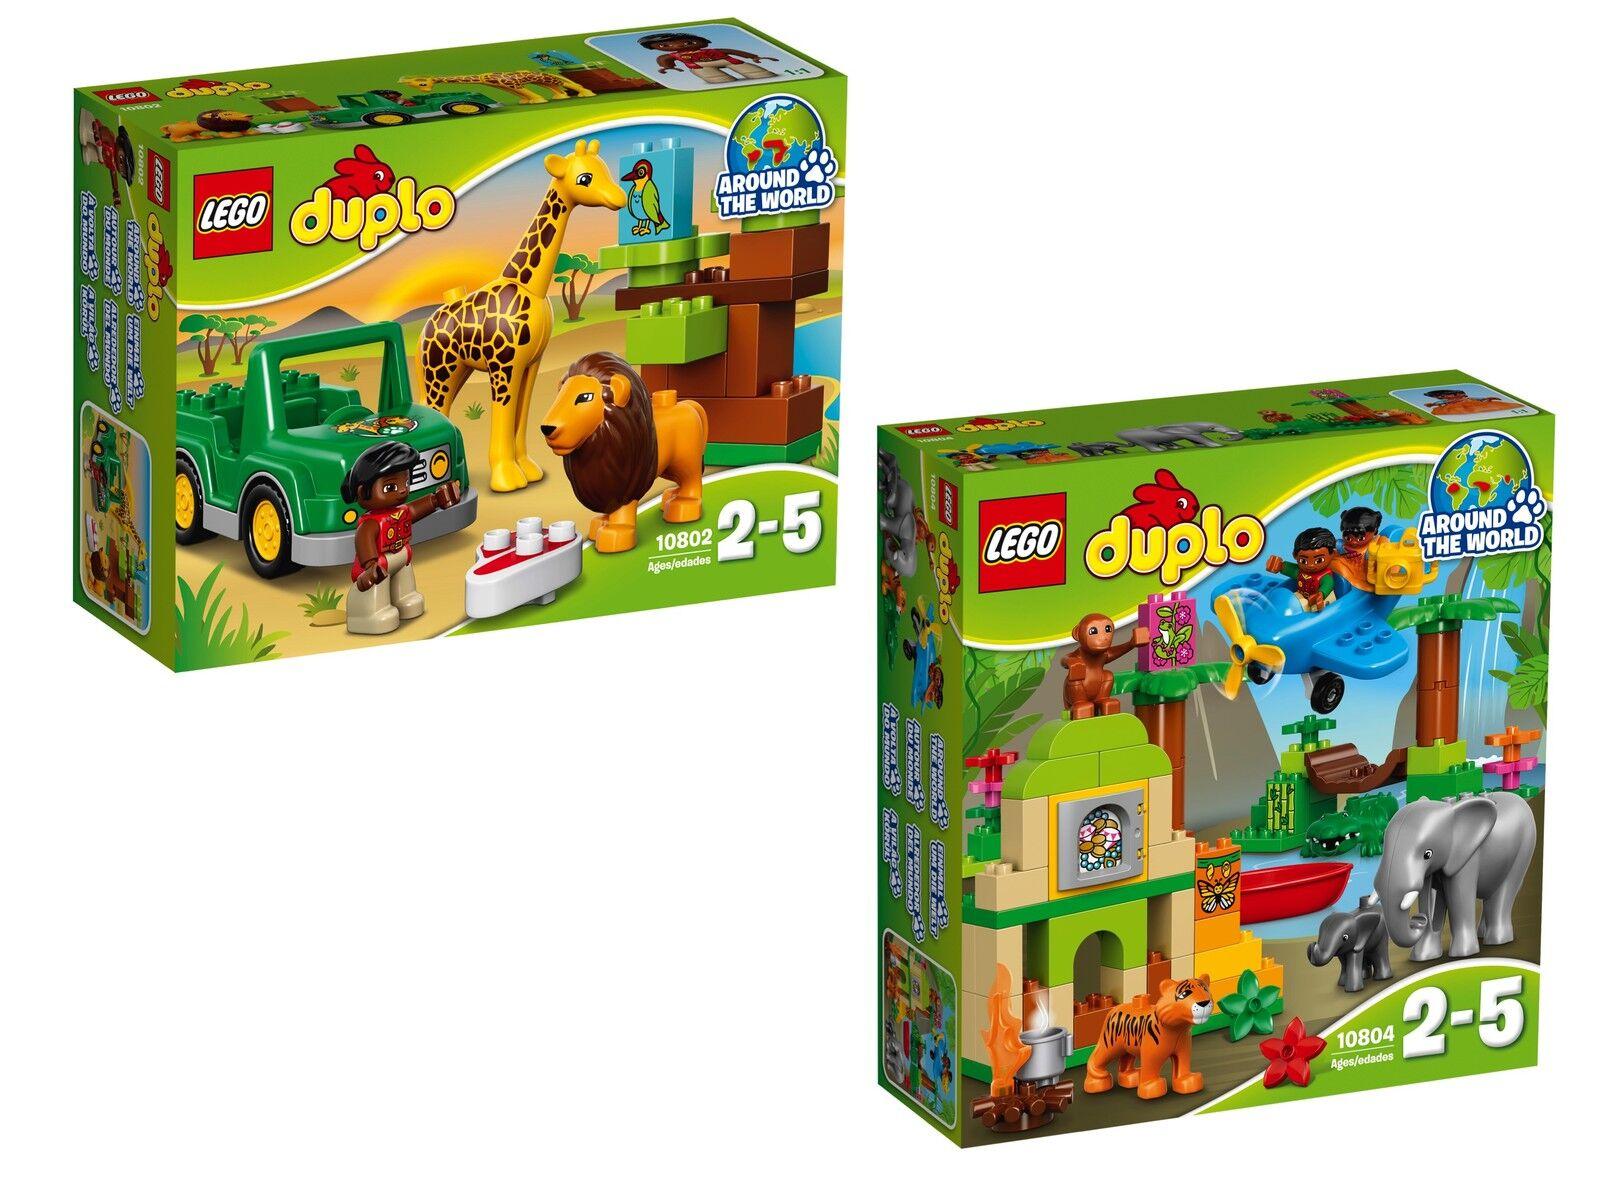 LEGO ® DUPLO ® confezione doppia 10802+10804 SAVANA + Giungla NUOVO OVP NEW MISB NRFB